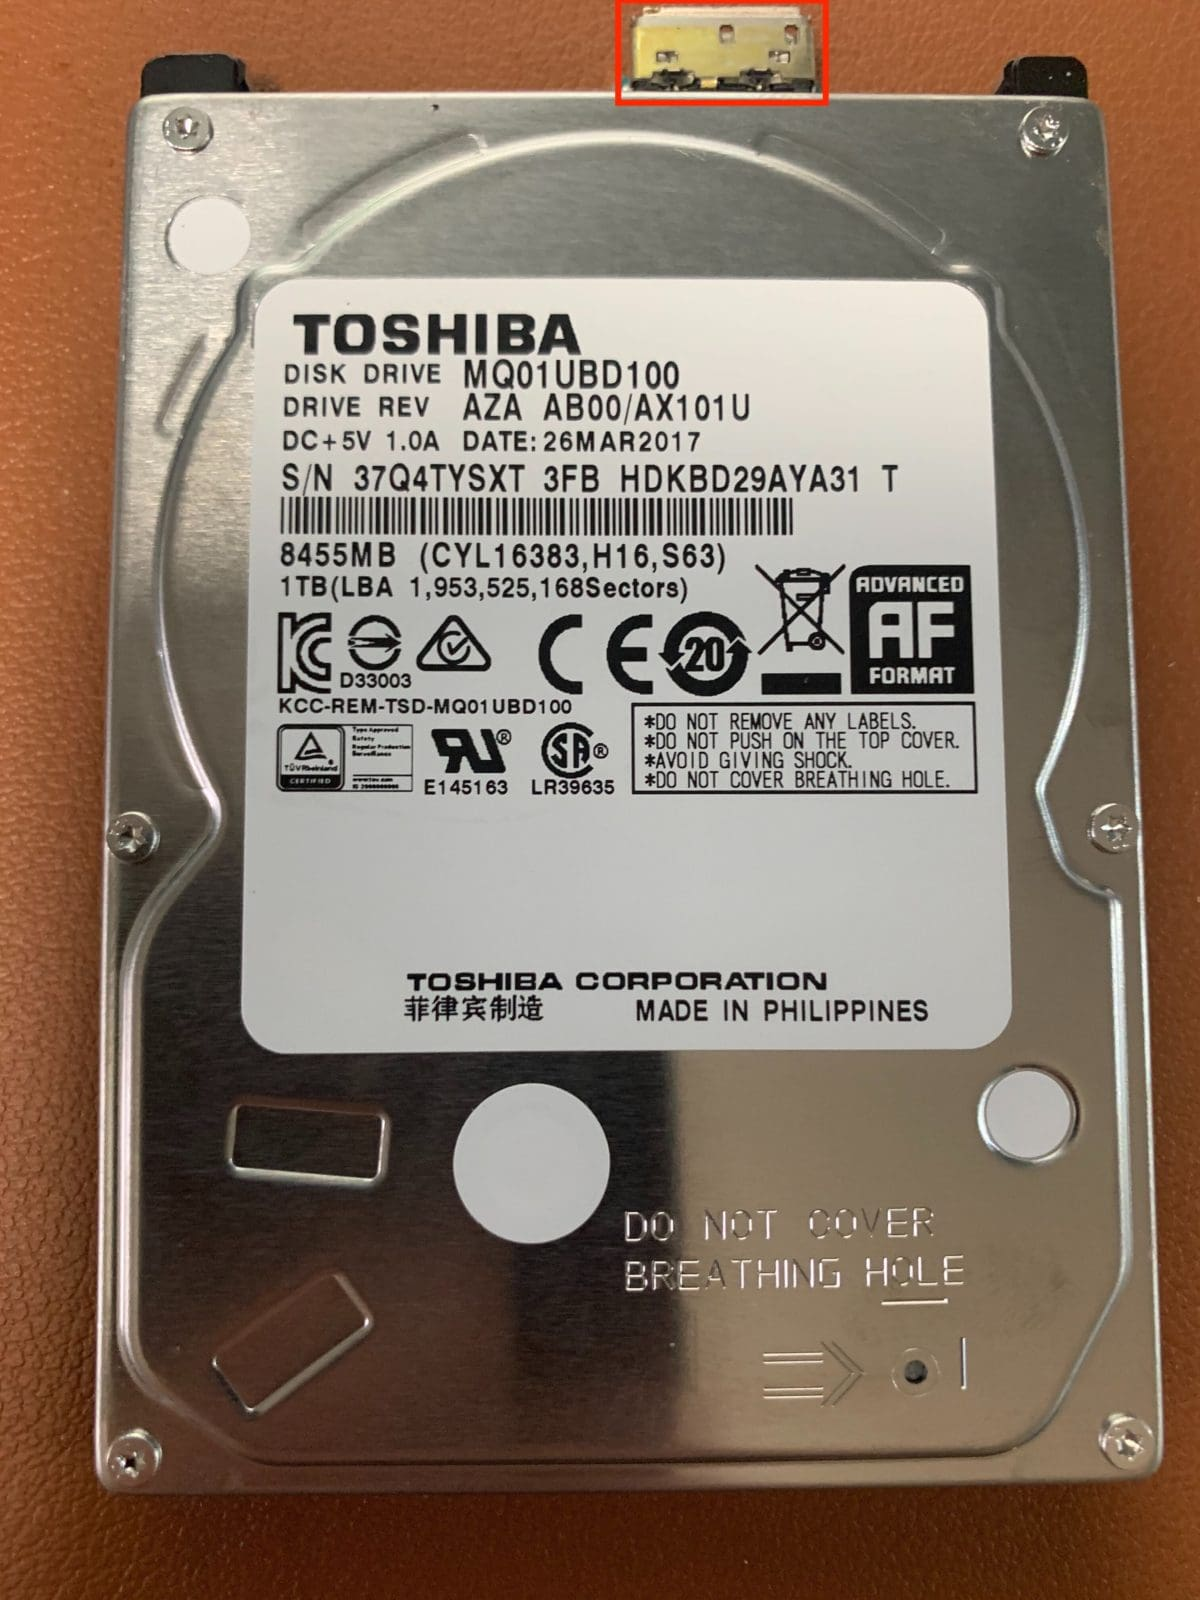 Toshiba USB External Drive Recovery